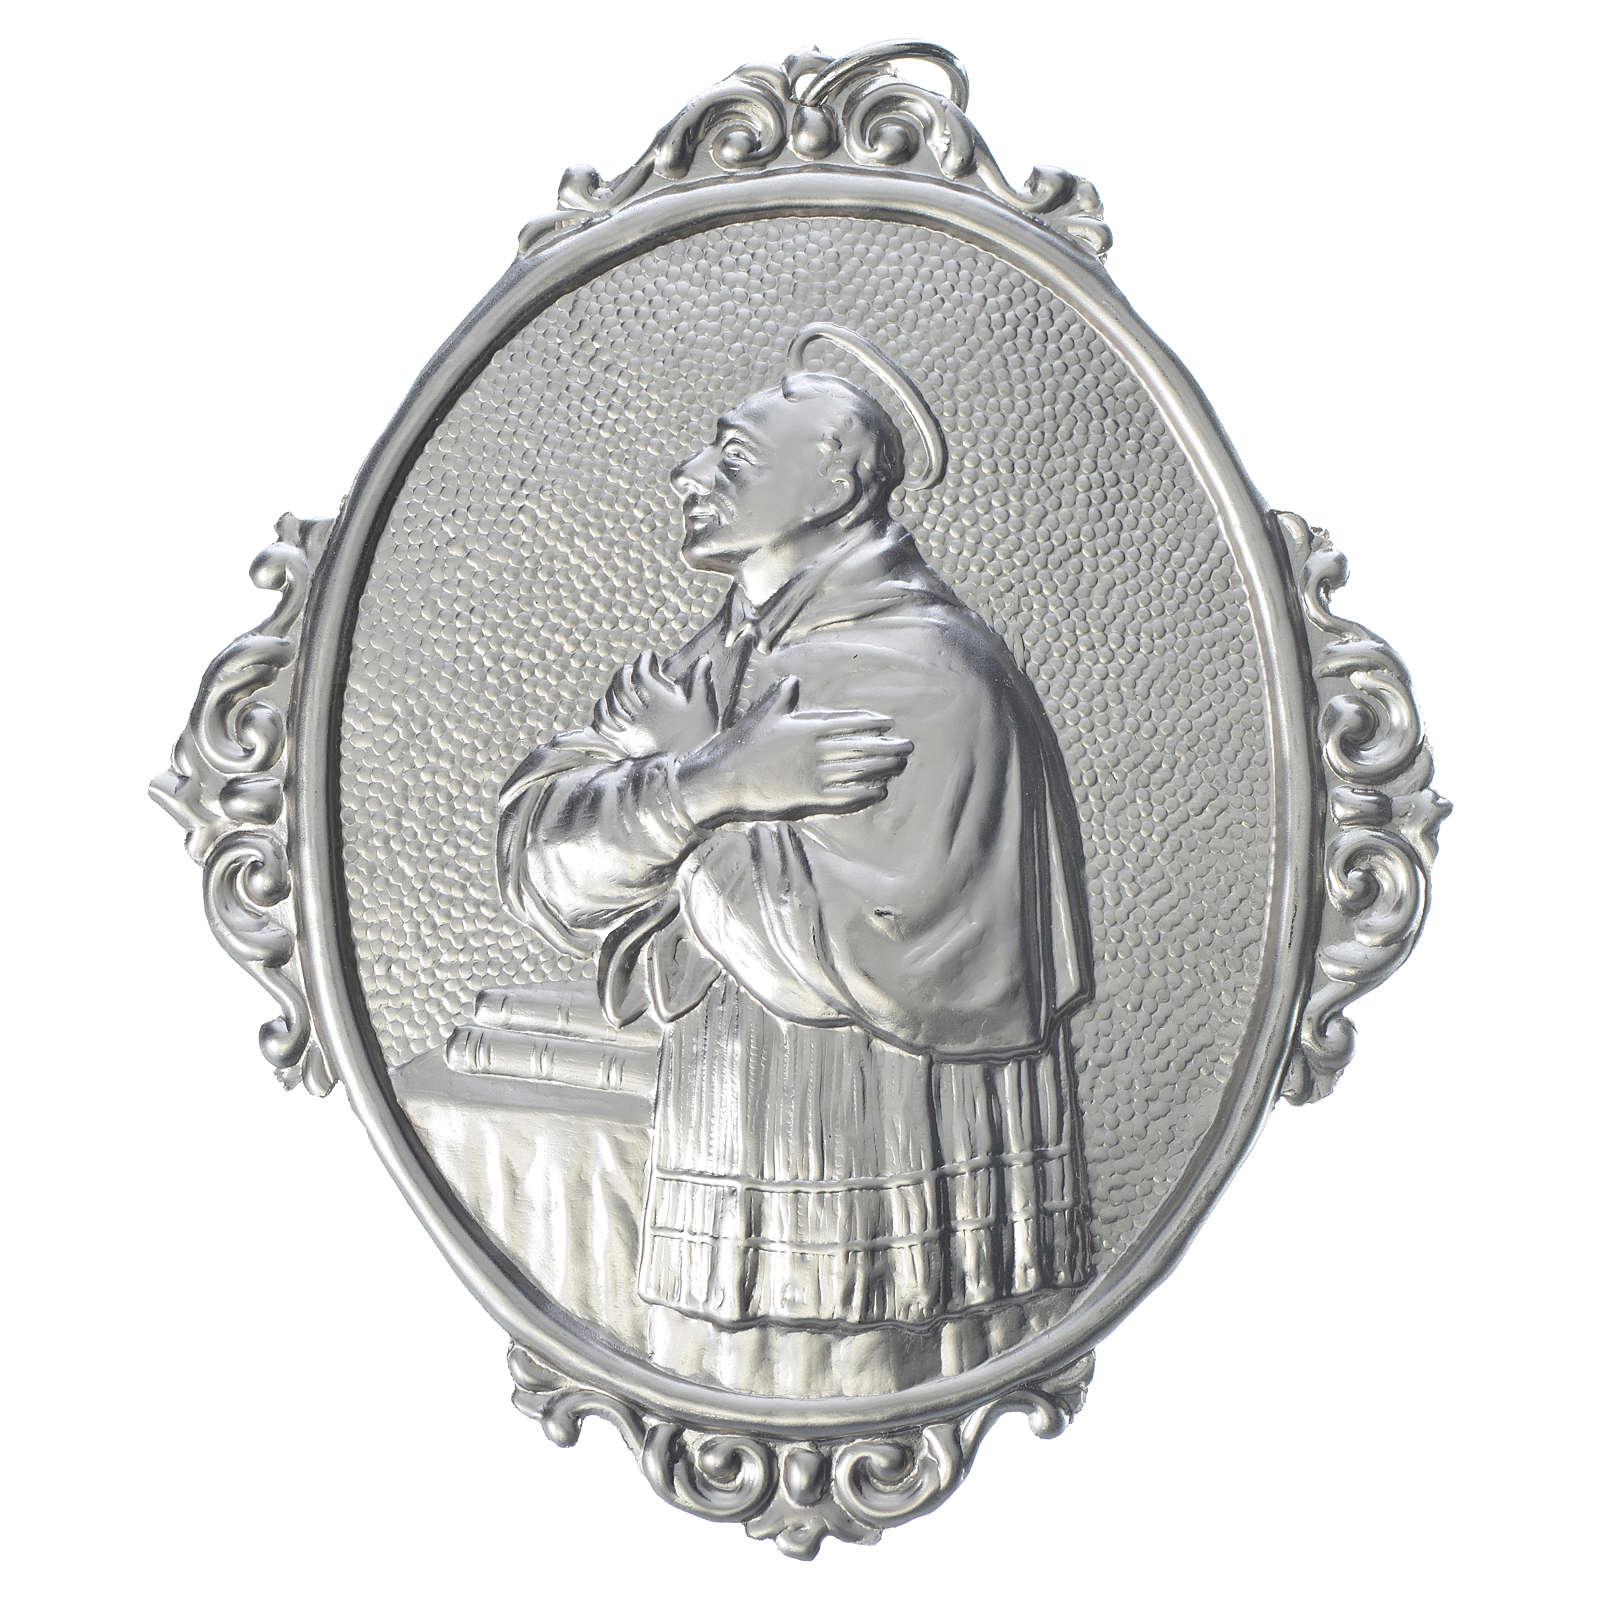 Confraternity Medal in brass, Saint Charles Borromeo 3